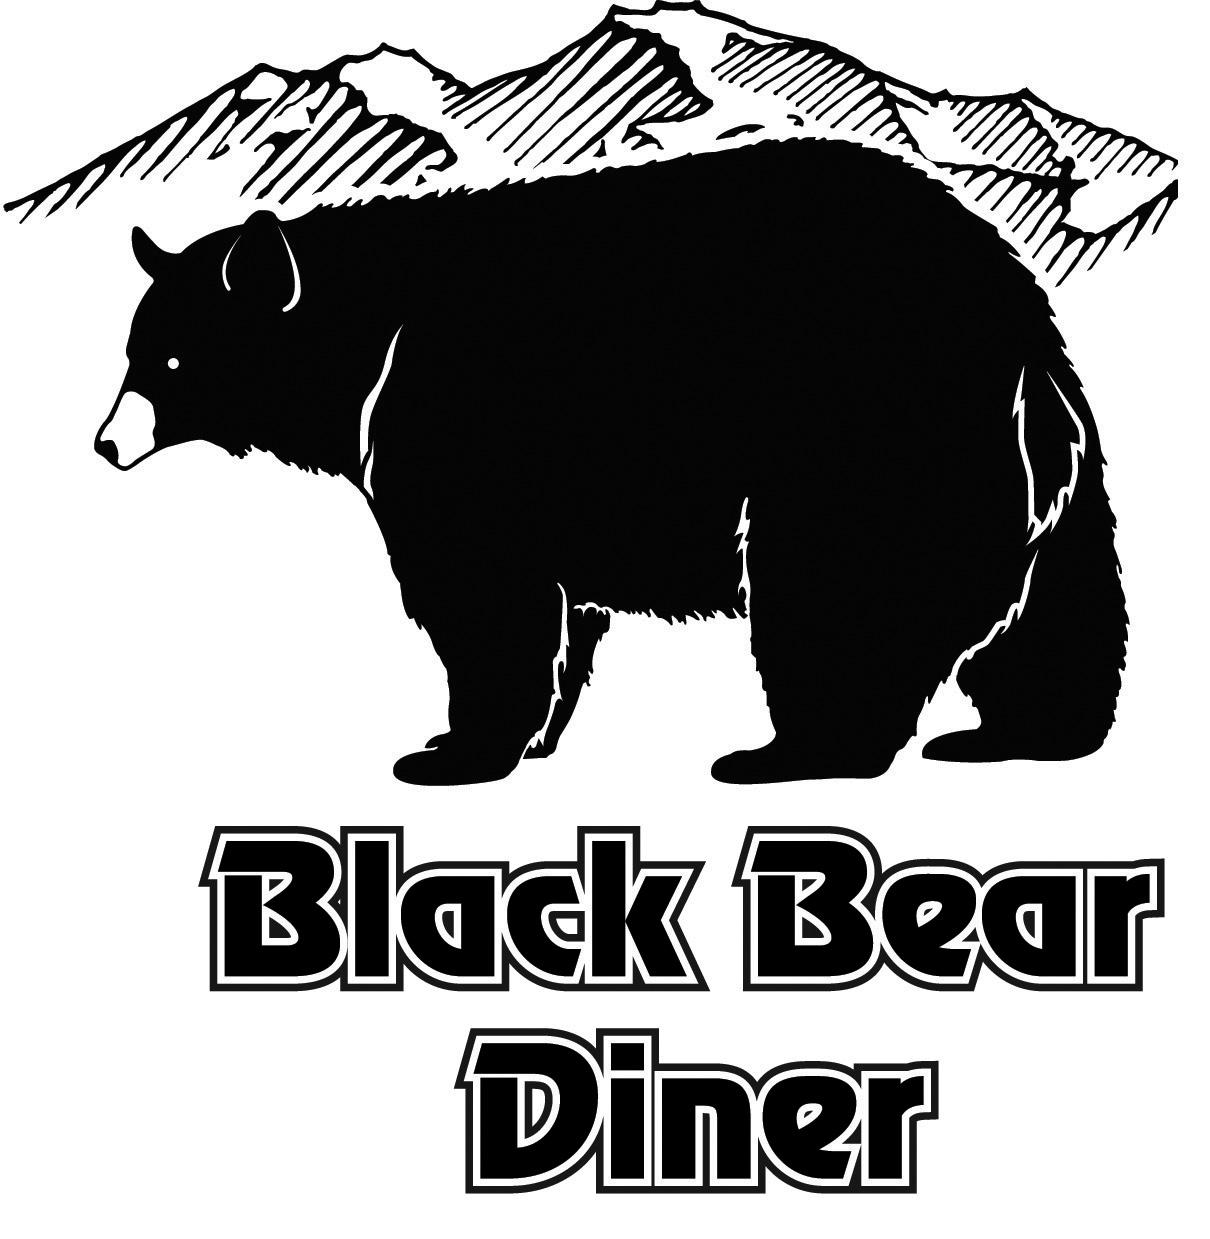 Black bear diner logo - photo#1